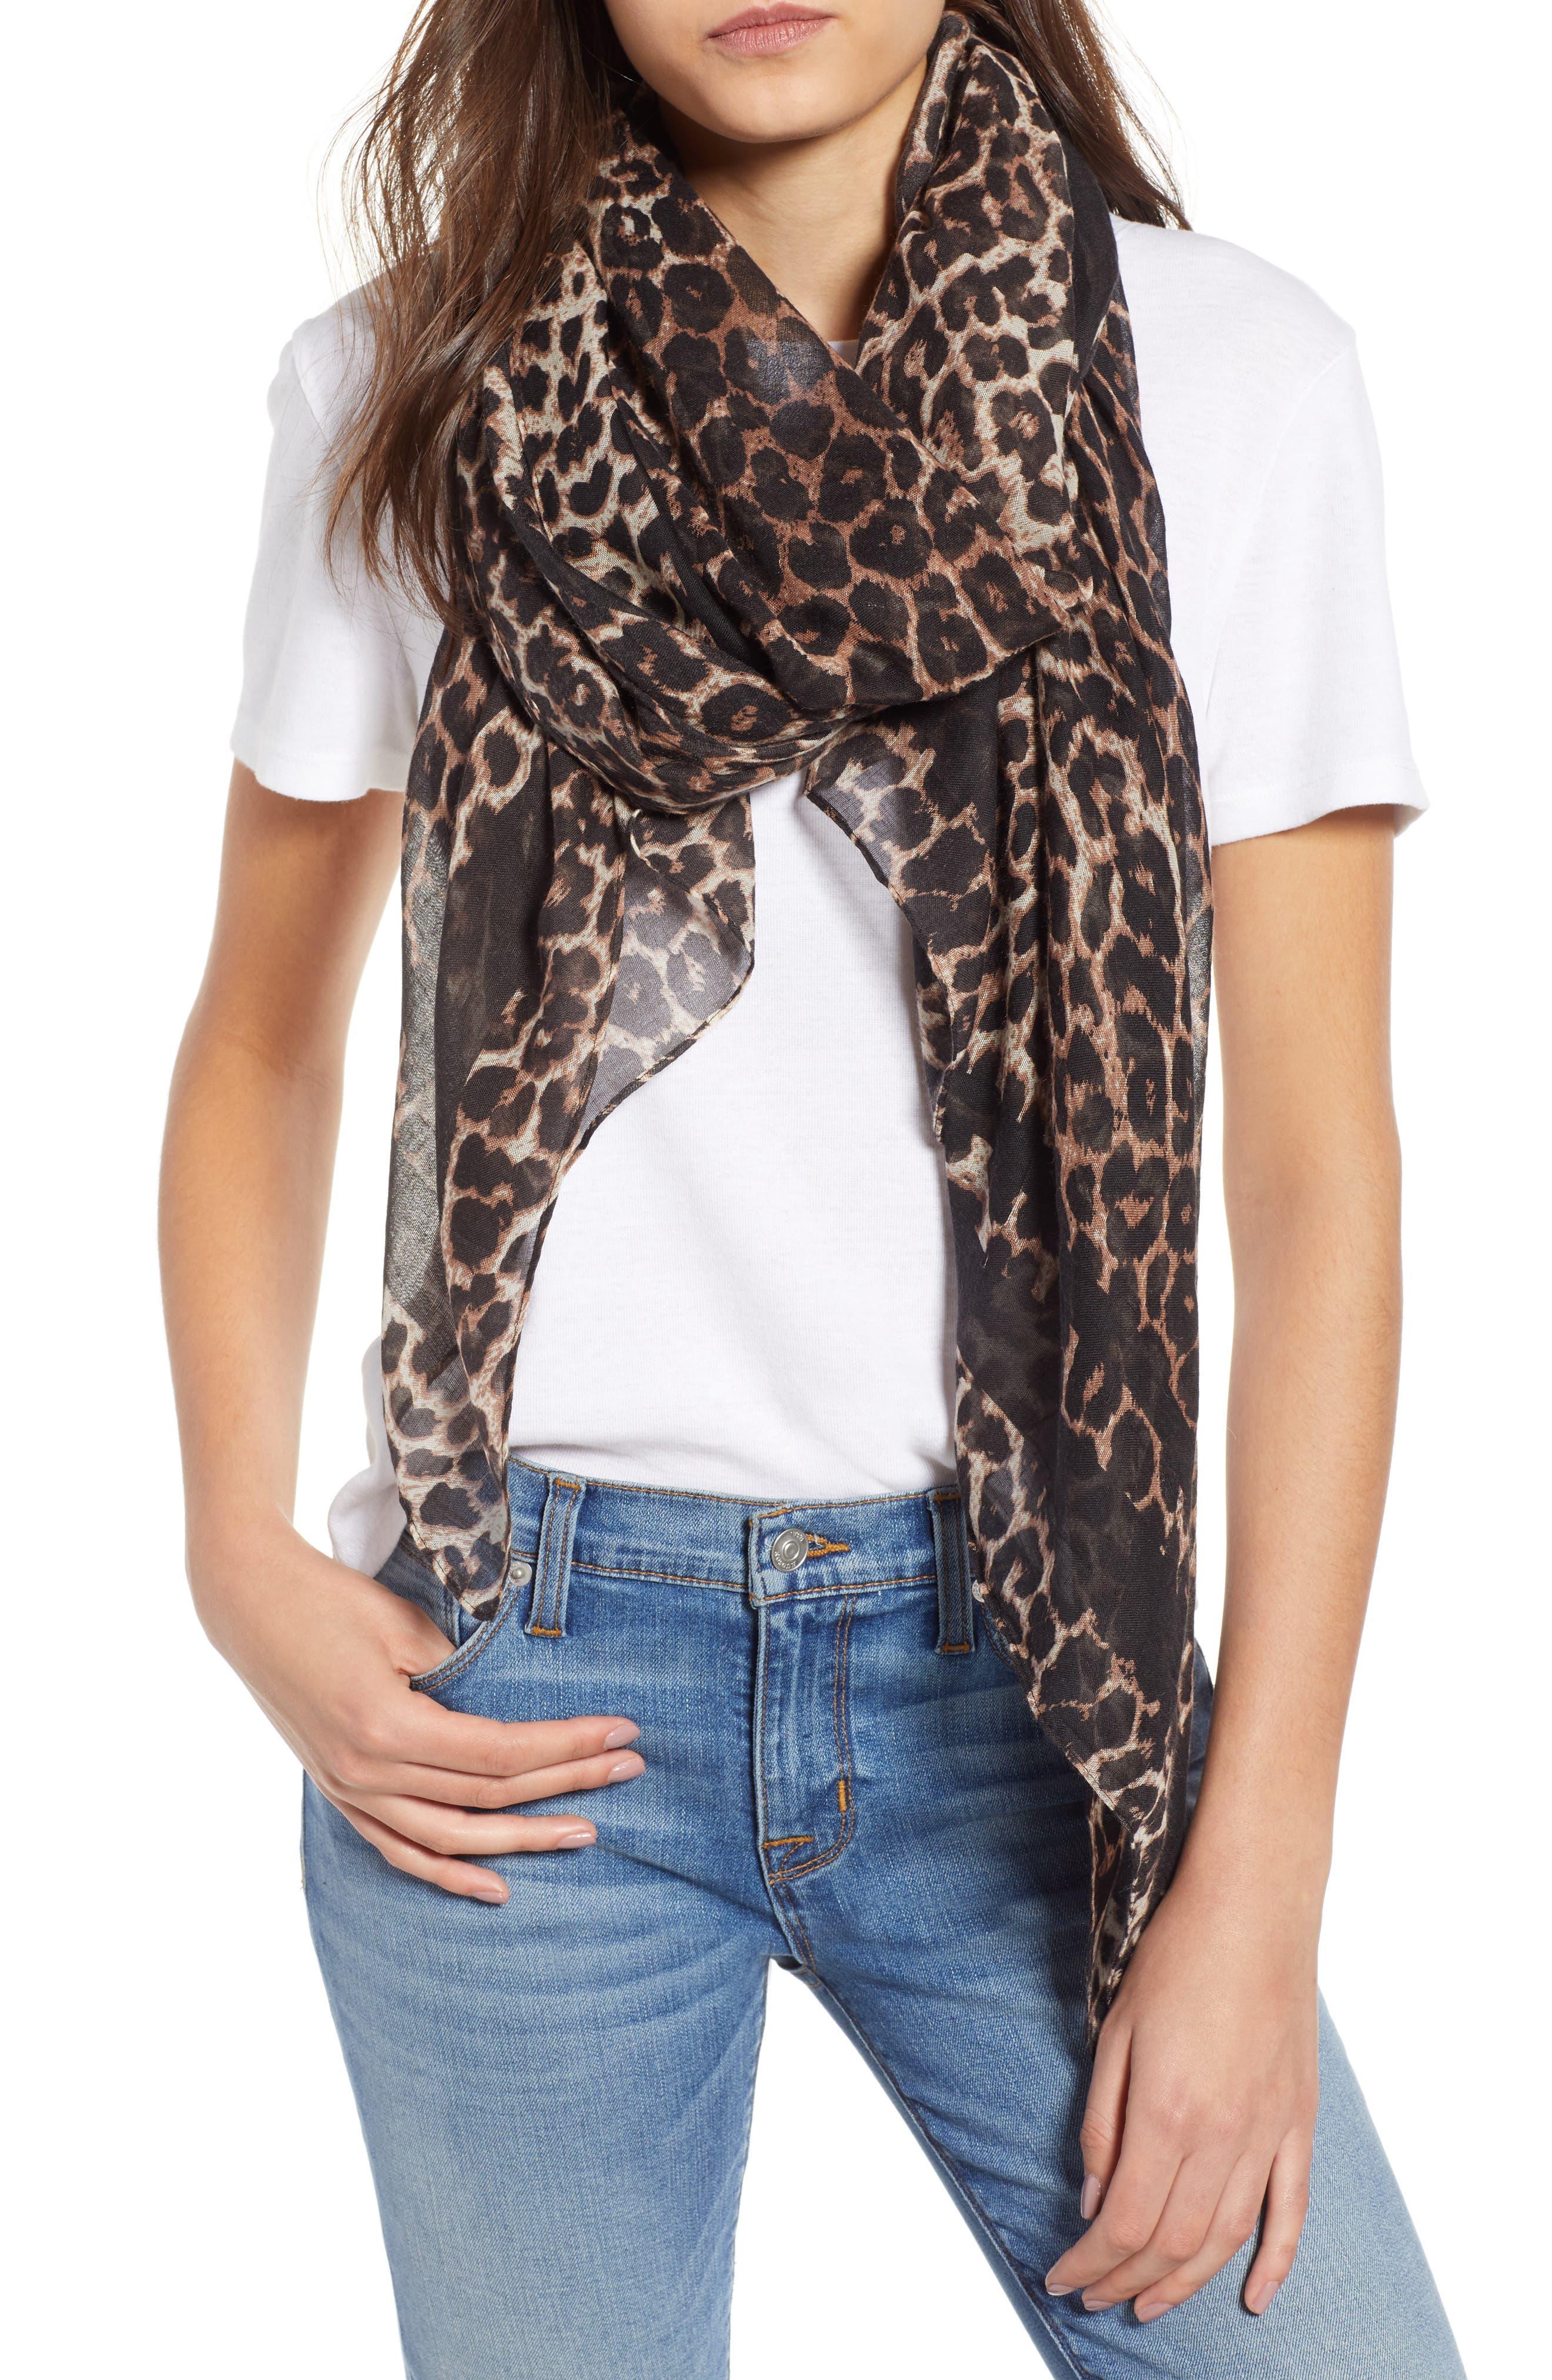 Leopard grey print scarf photo exclusive photo